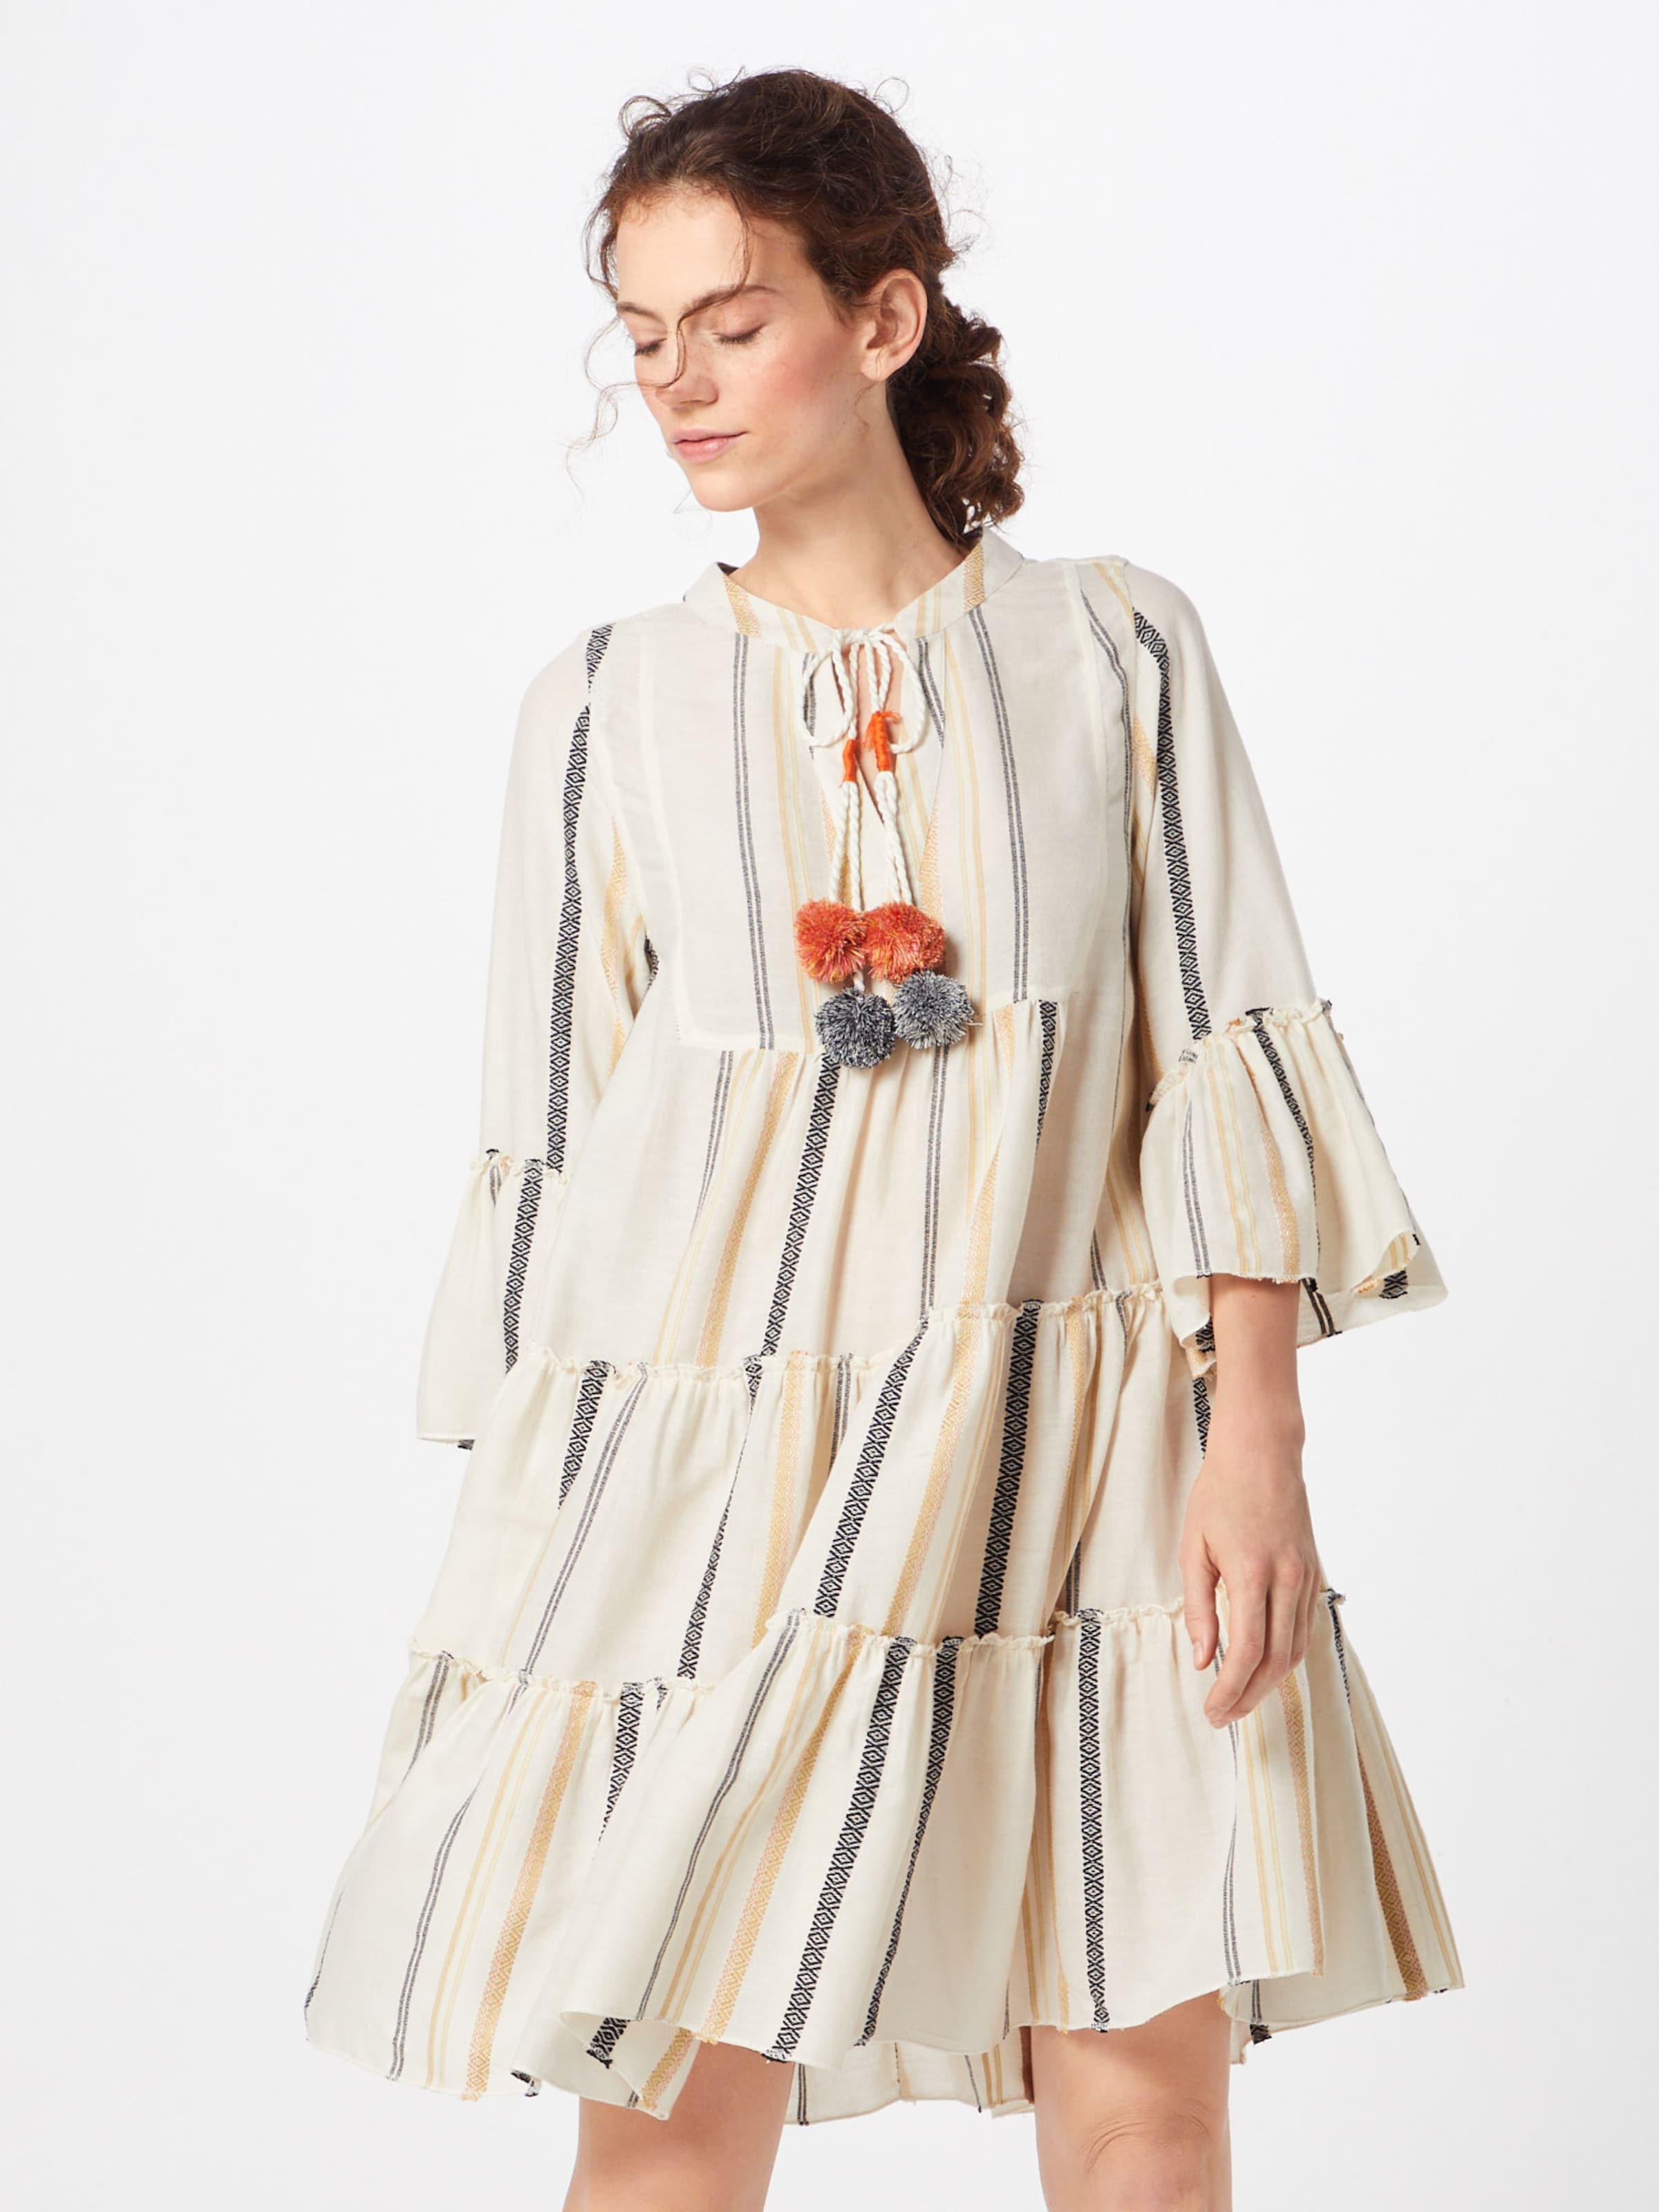 Offwhite In Buddha Funky Kleid AnthrazitHellorange rBxodCe